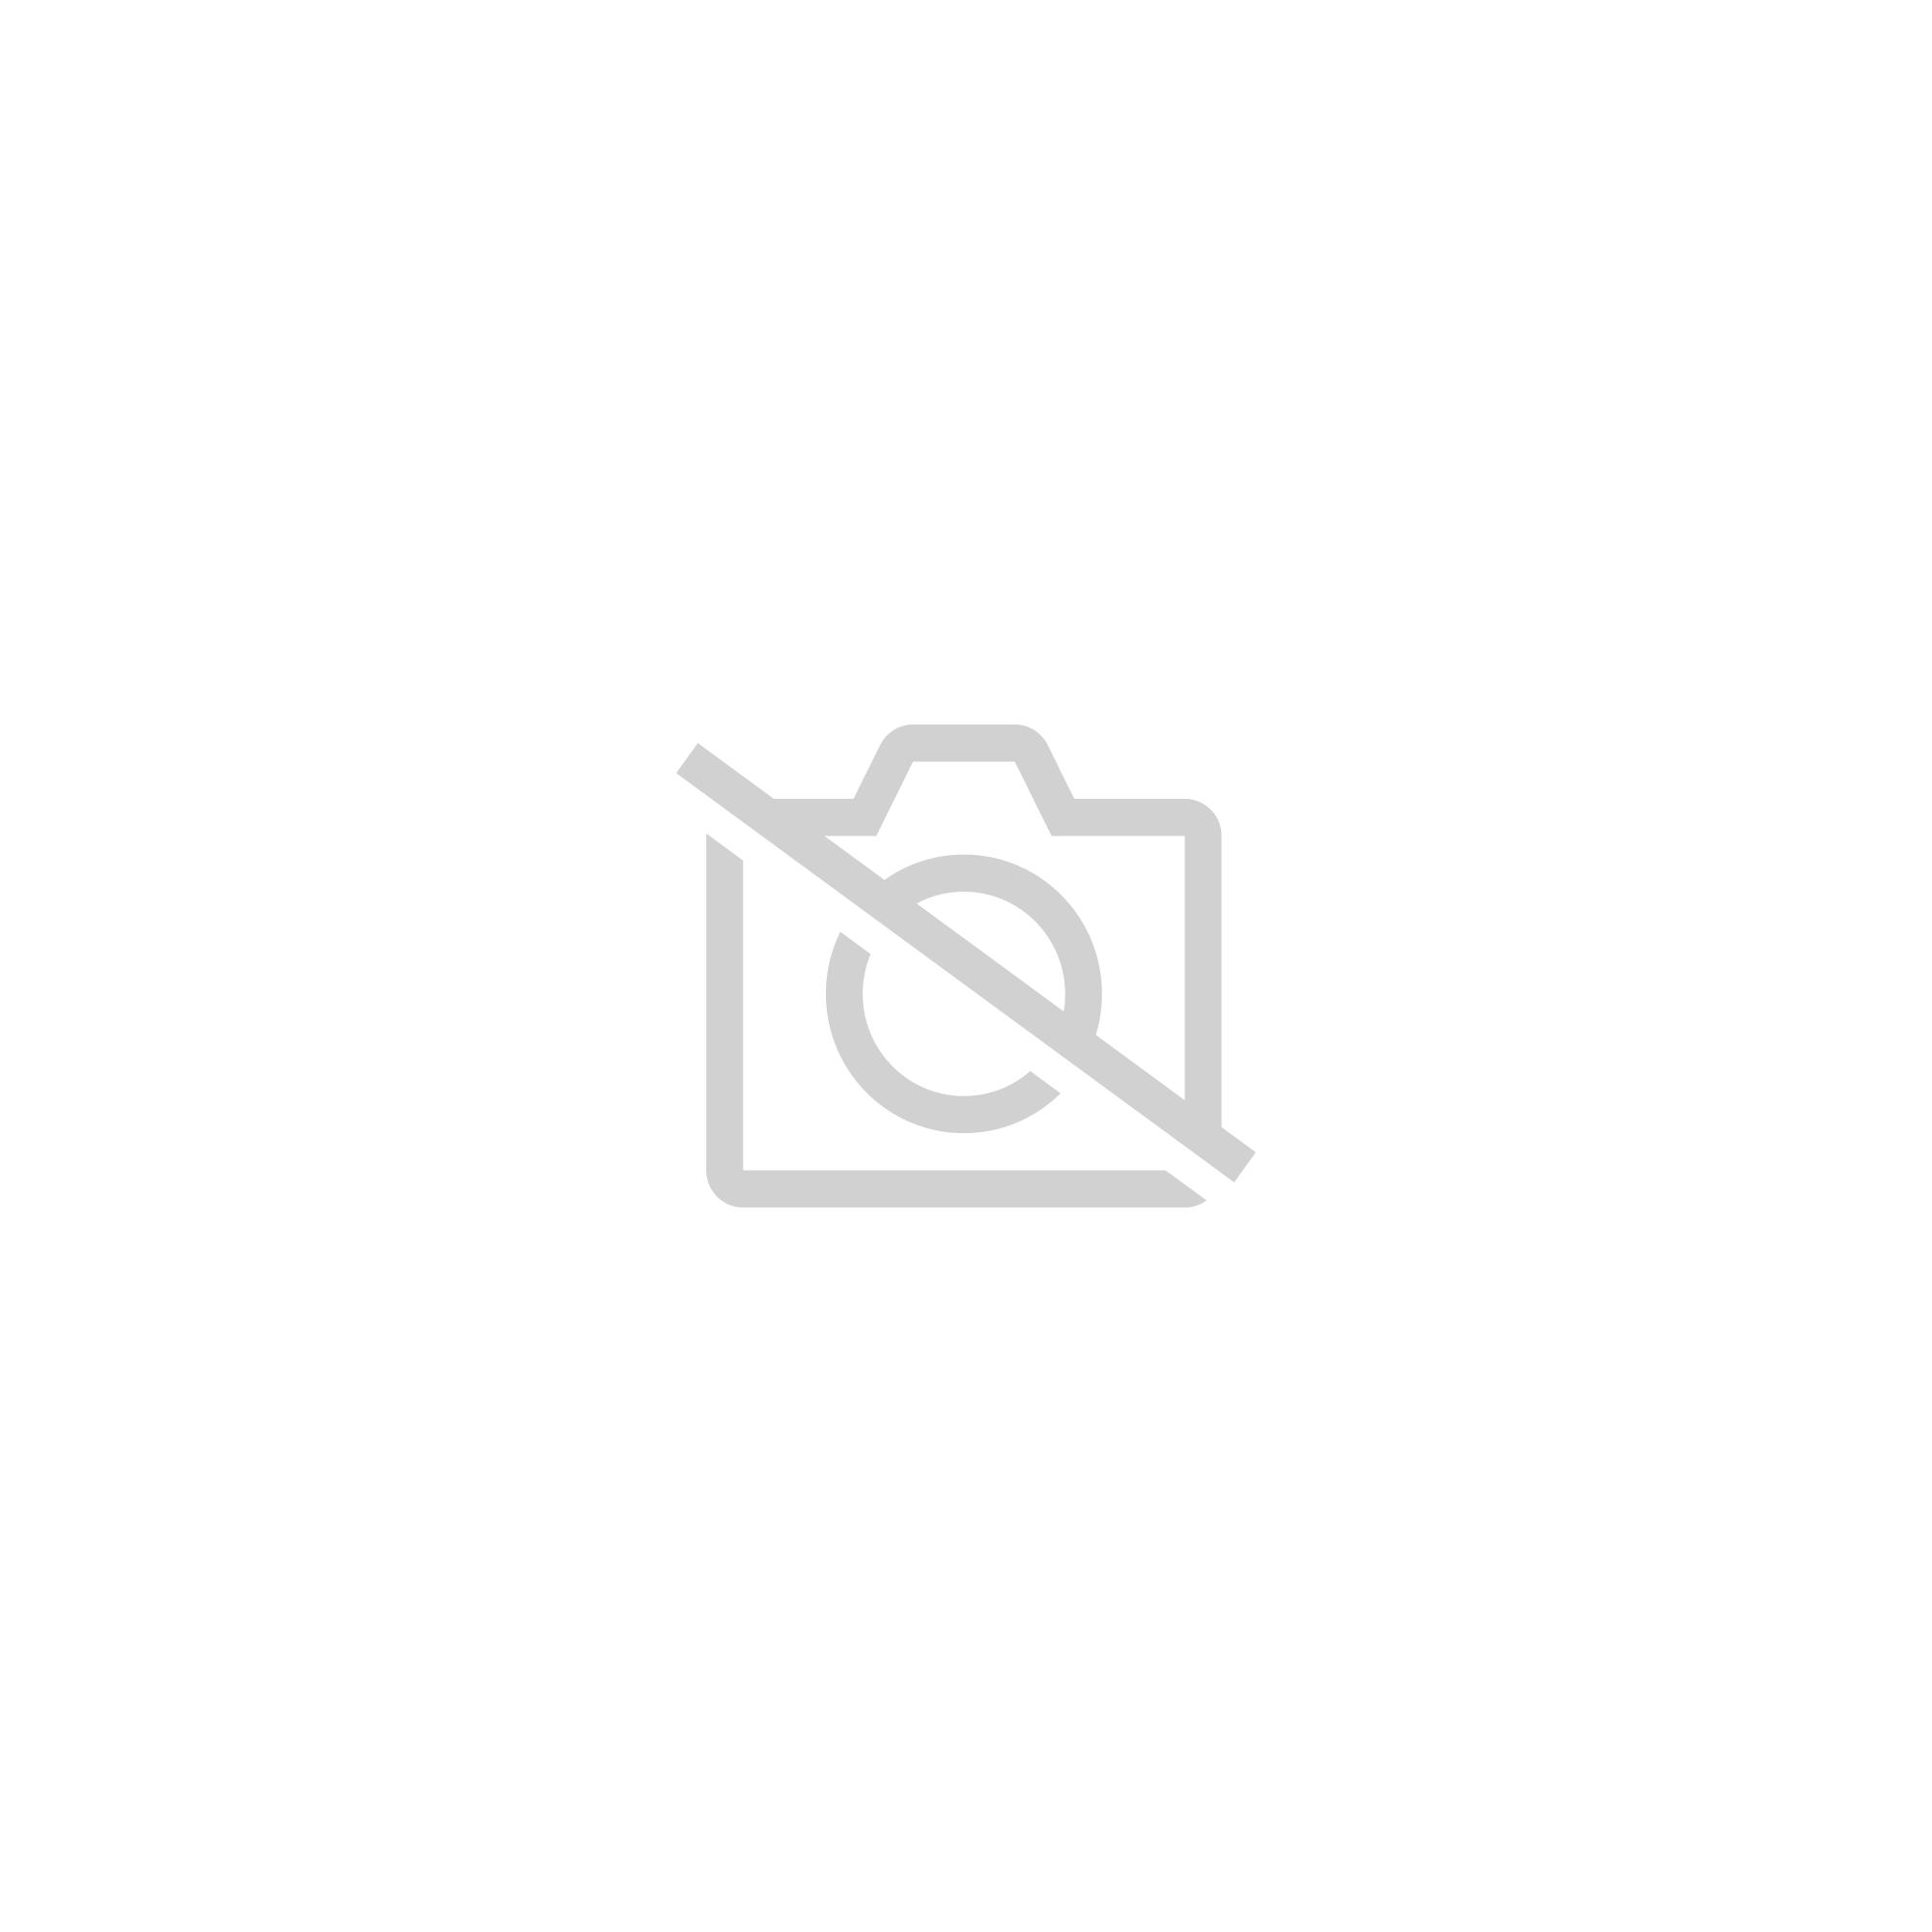 Eric Emmanuel Schmitt - La trahison d'Einstein 971865128